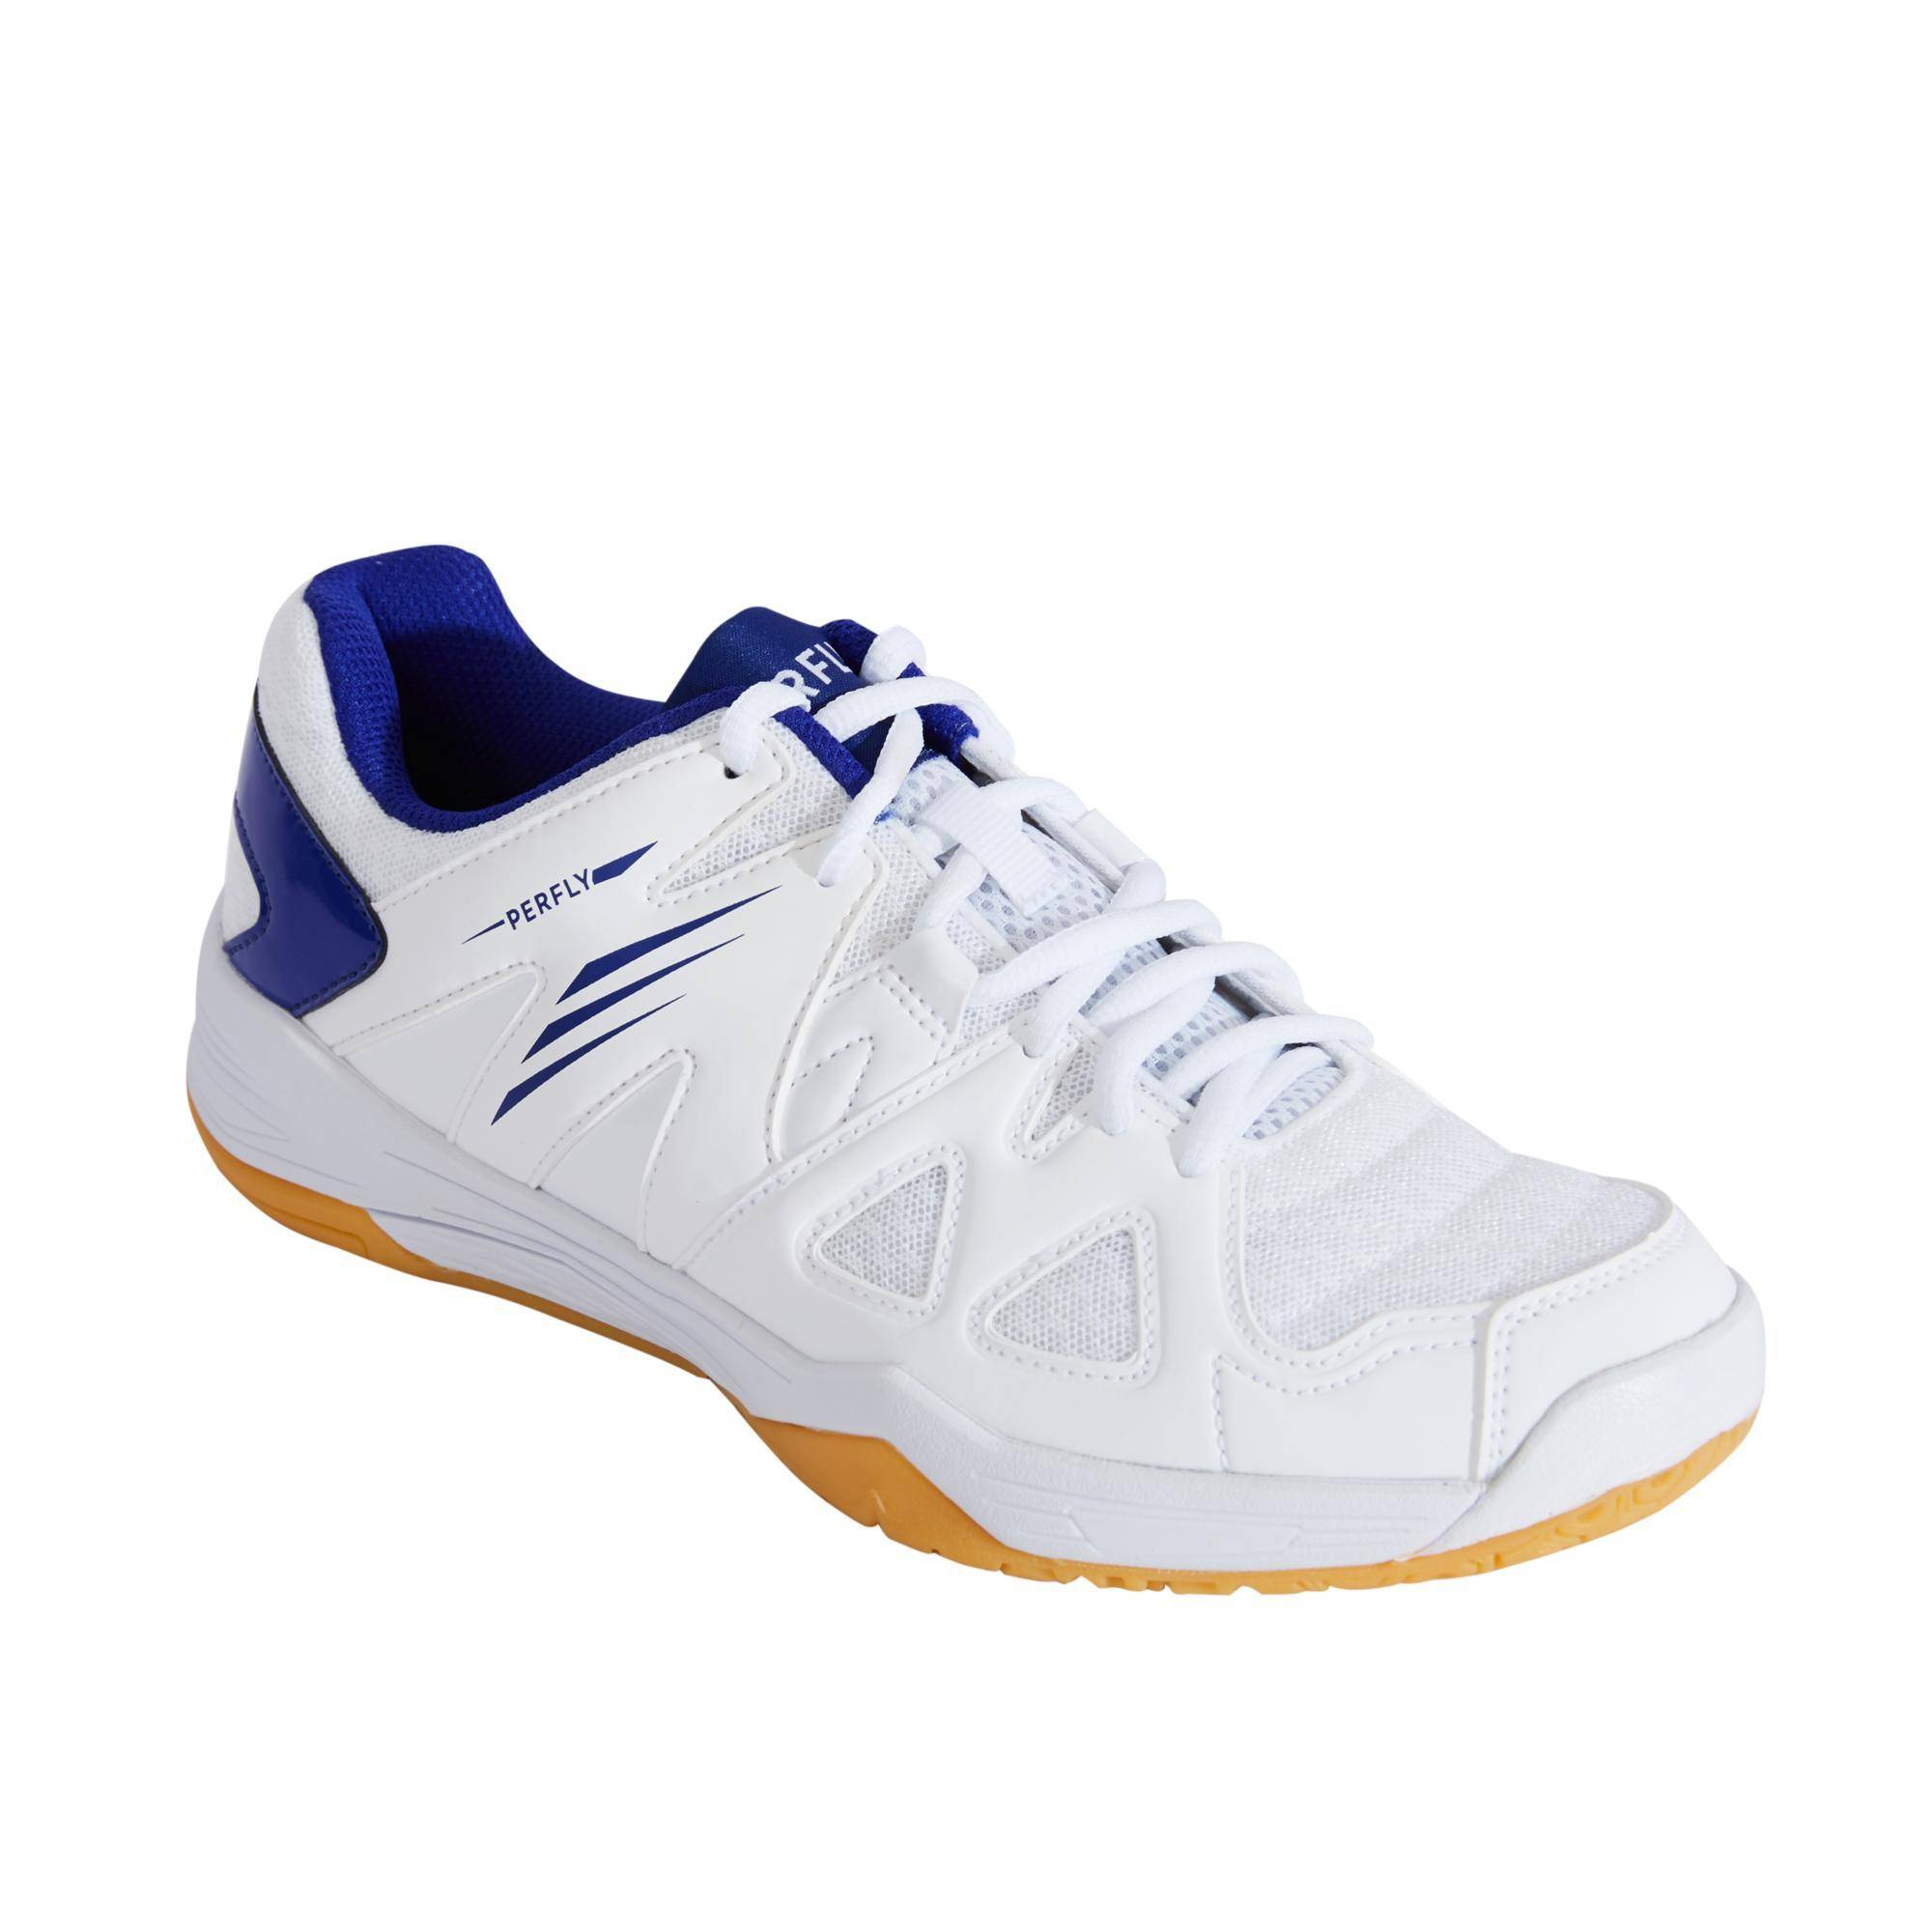 PERFLY Chaussures De Badminton Femme BS530 - Blanc/Bleu - PERFLY - 39